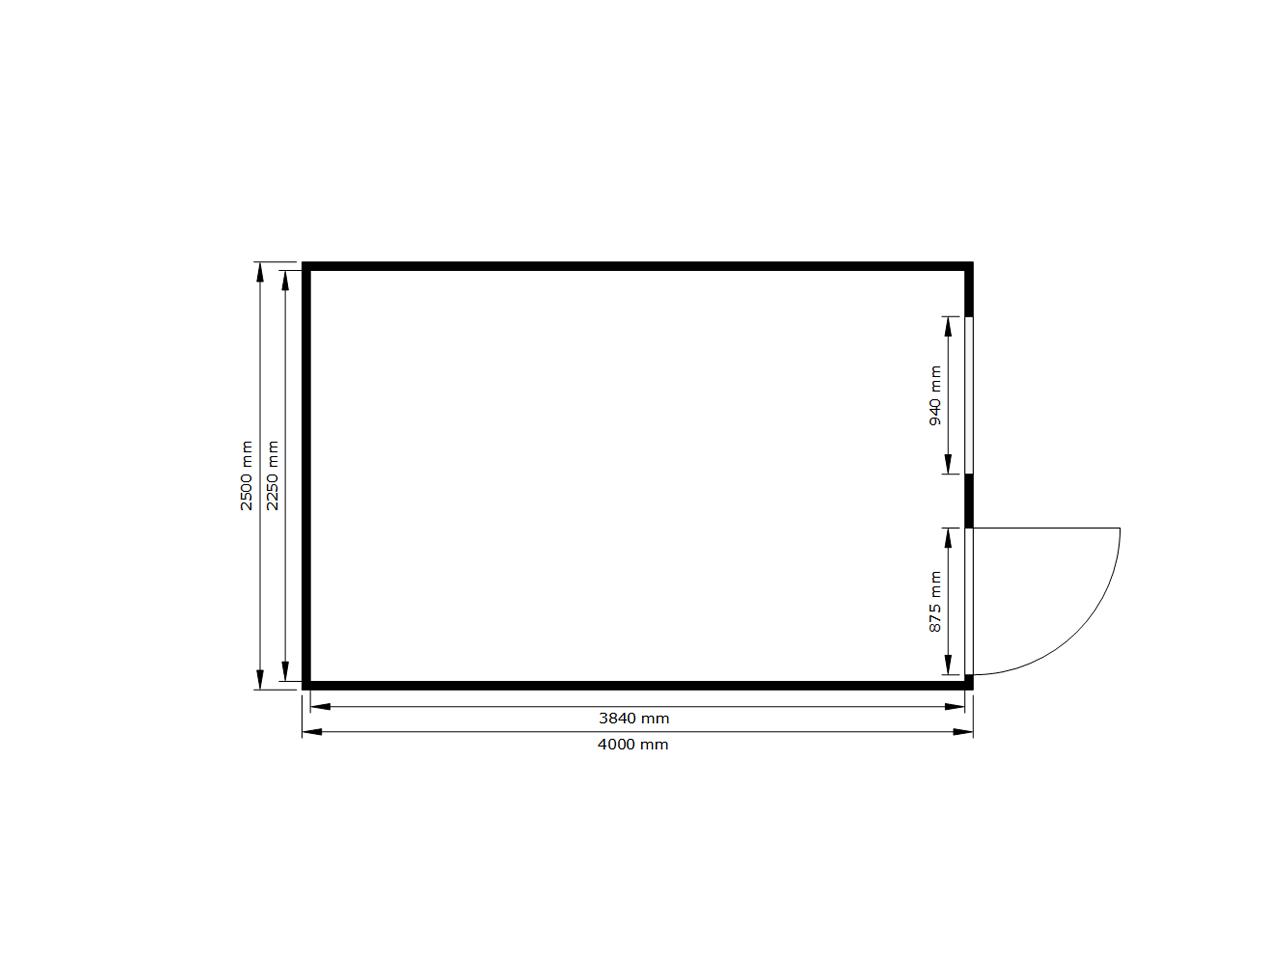 6857_FLADAFI-GRUNDRISS-Raumcontainer-4M-6857_RC4M6857_RGB_020_sl_bt.jpg